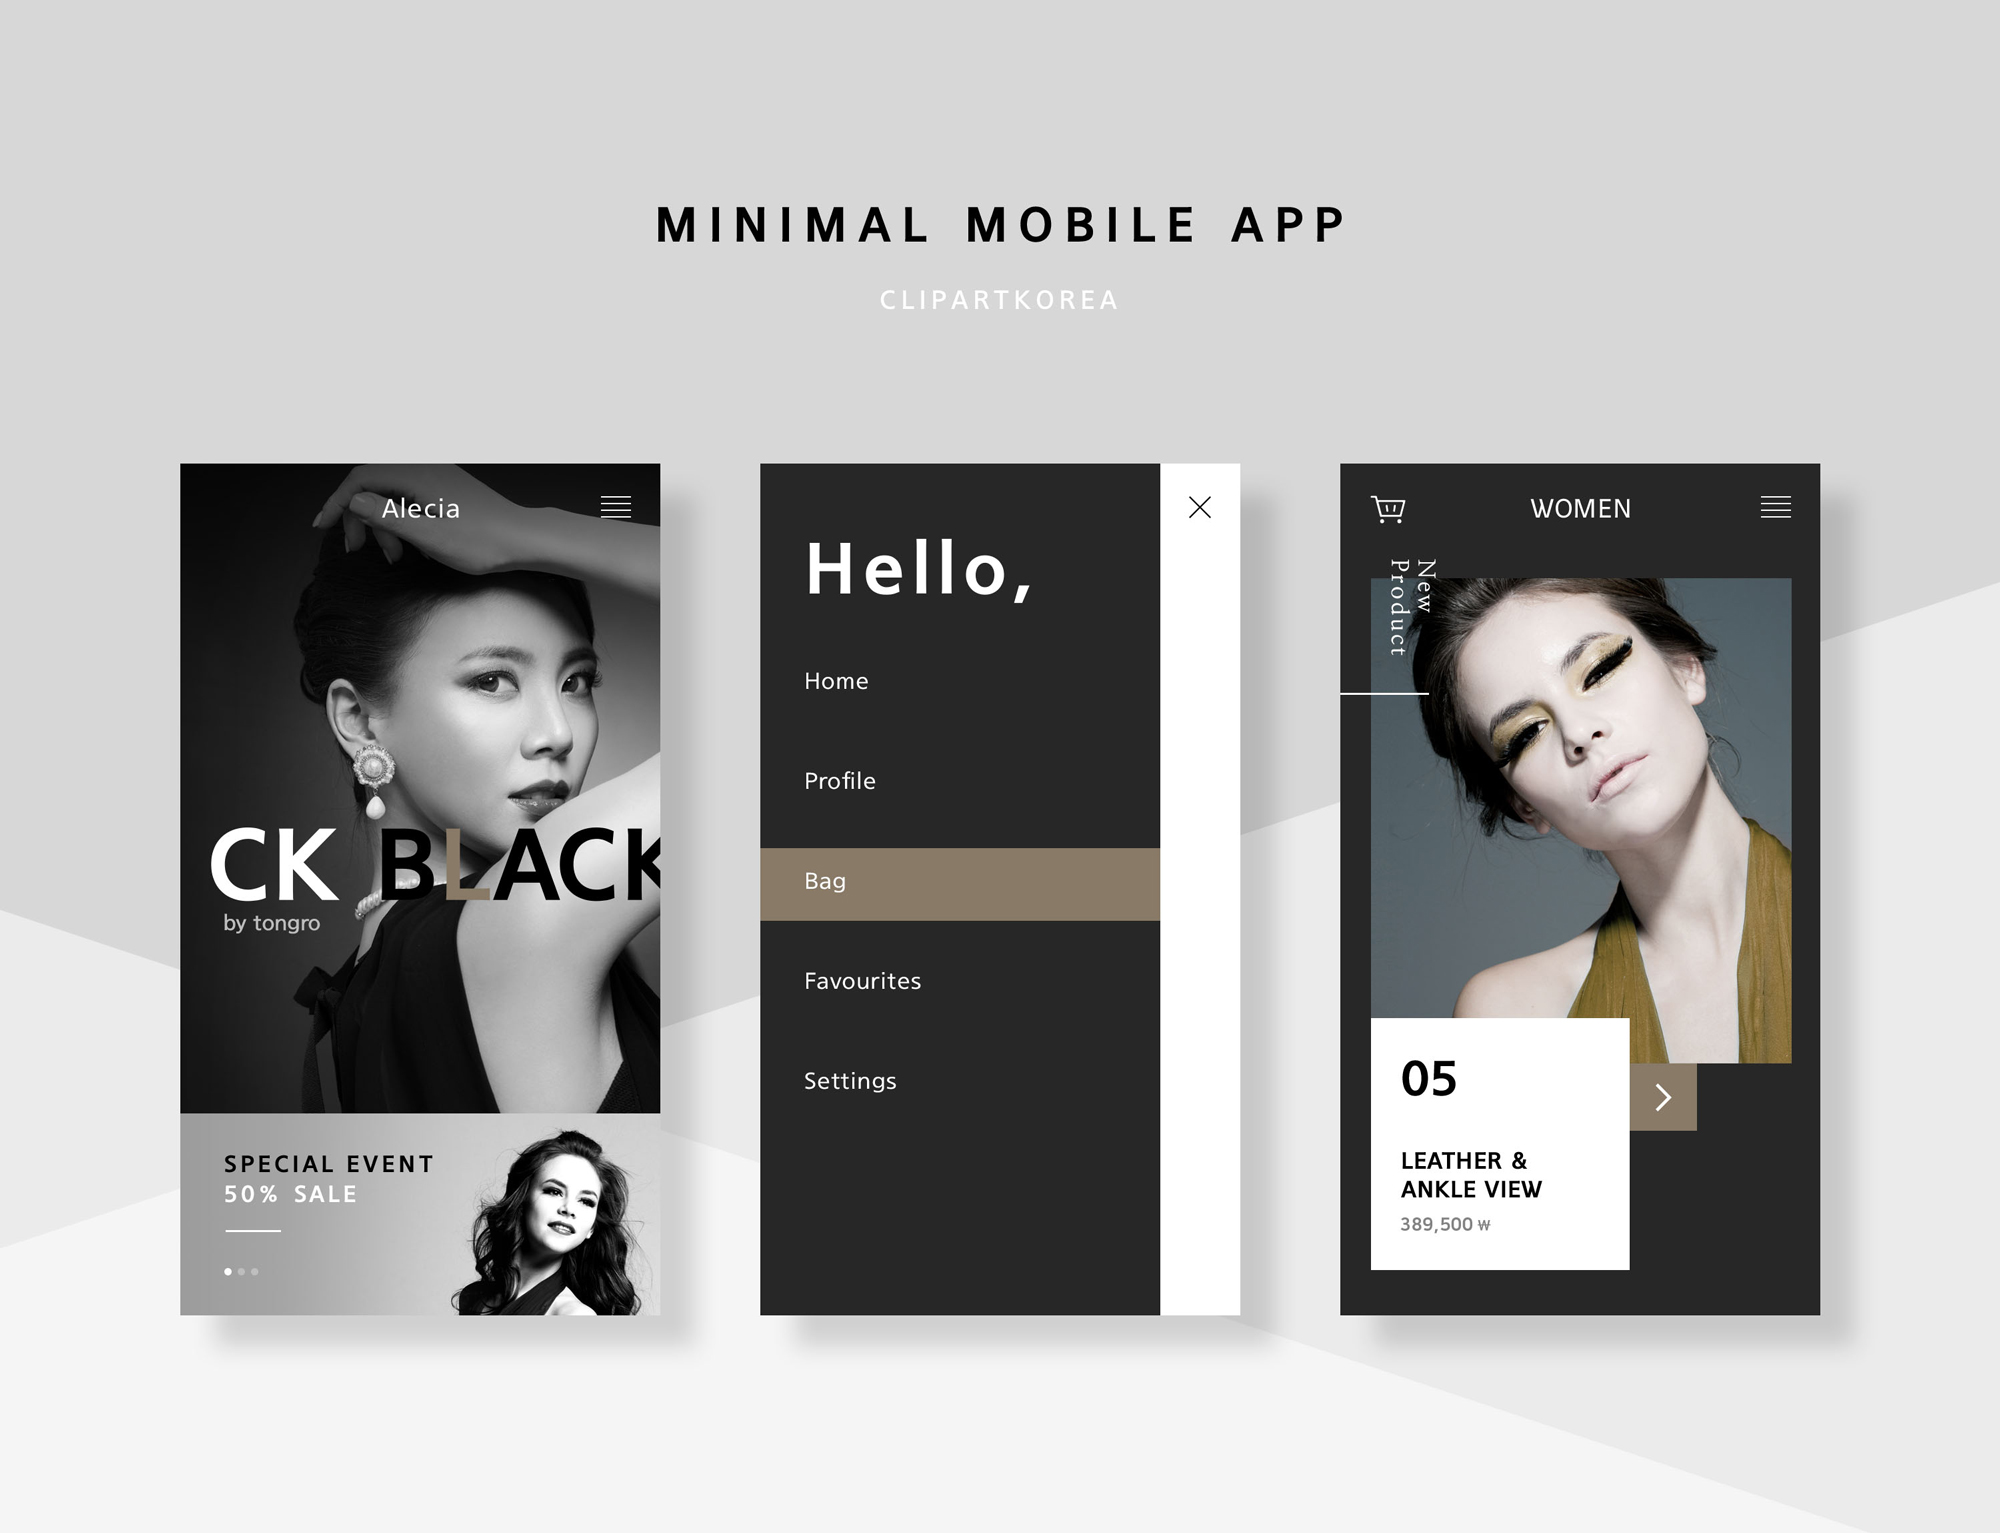 黑色扁平风购物APP minimal mobile app